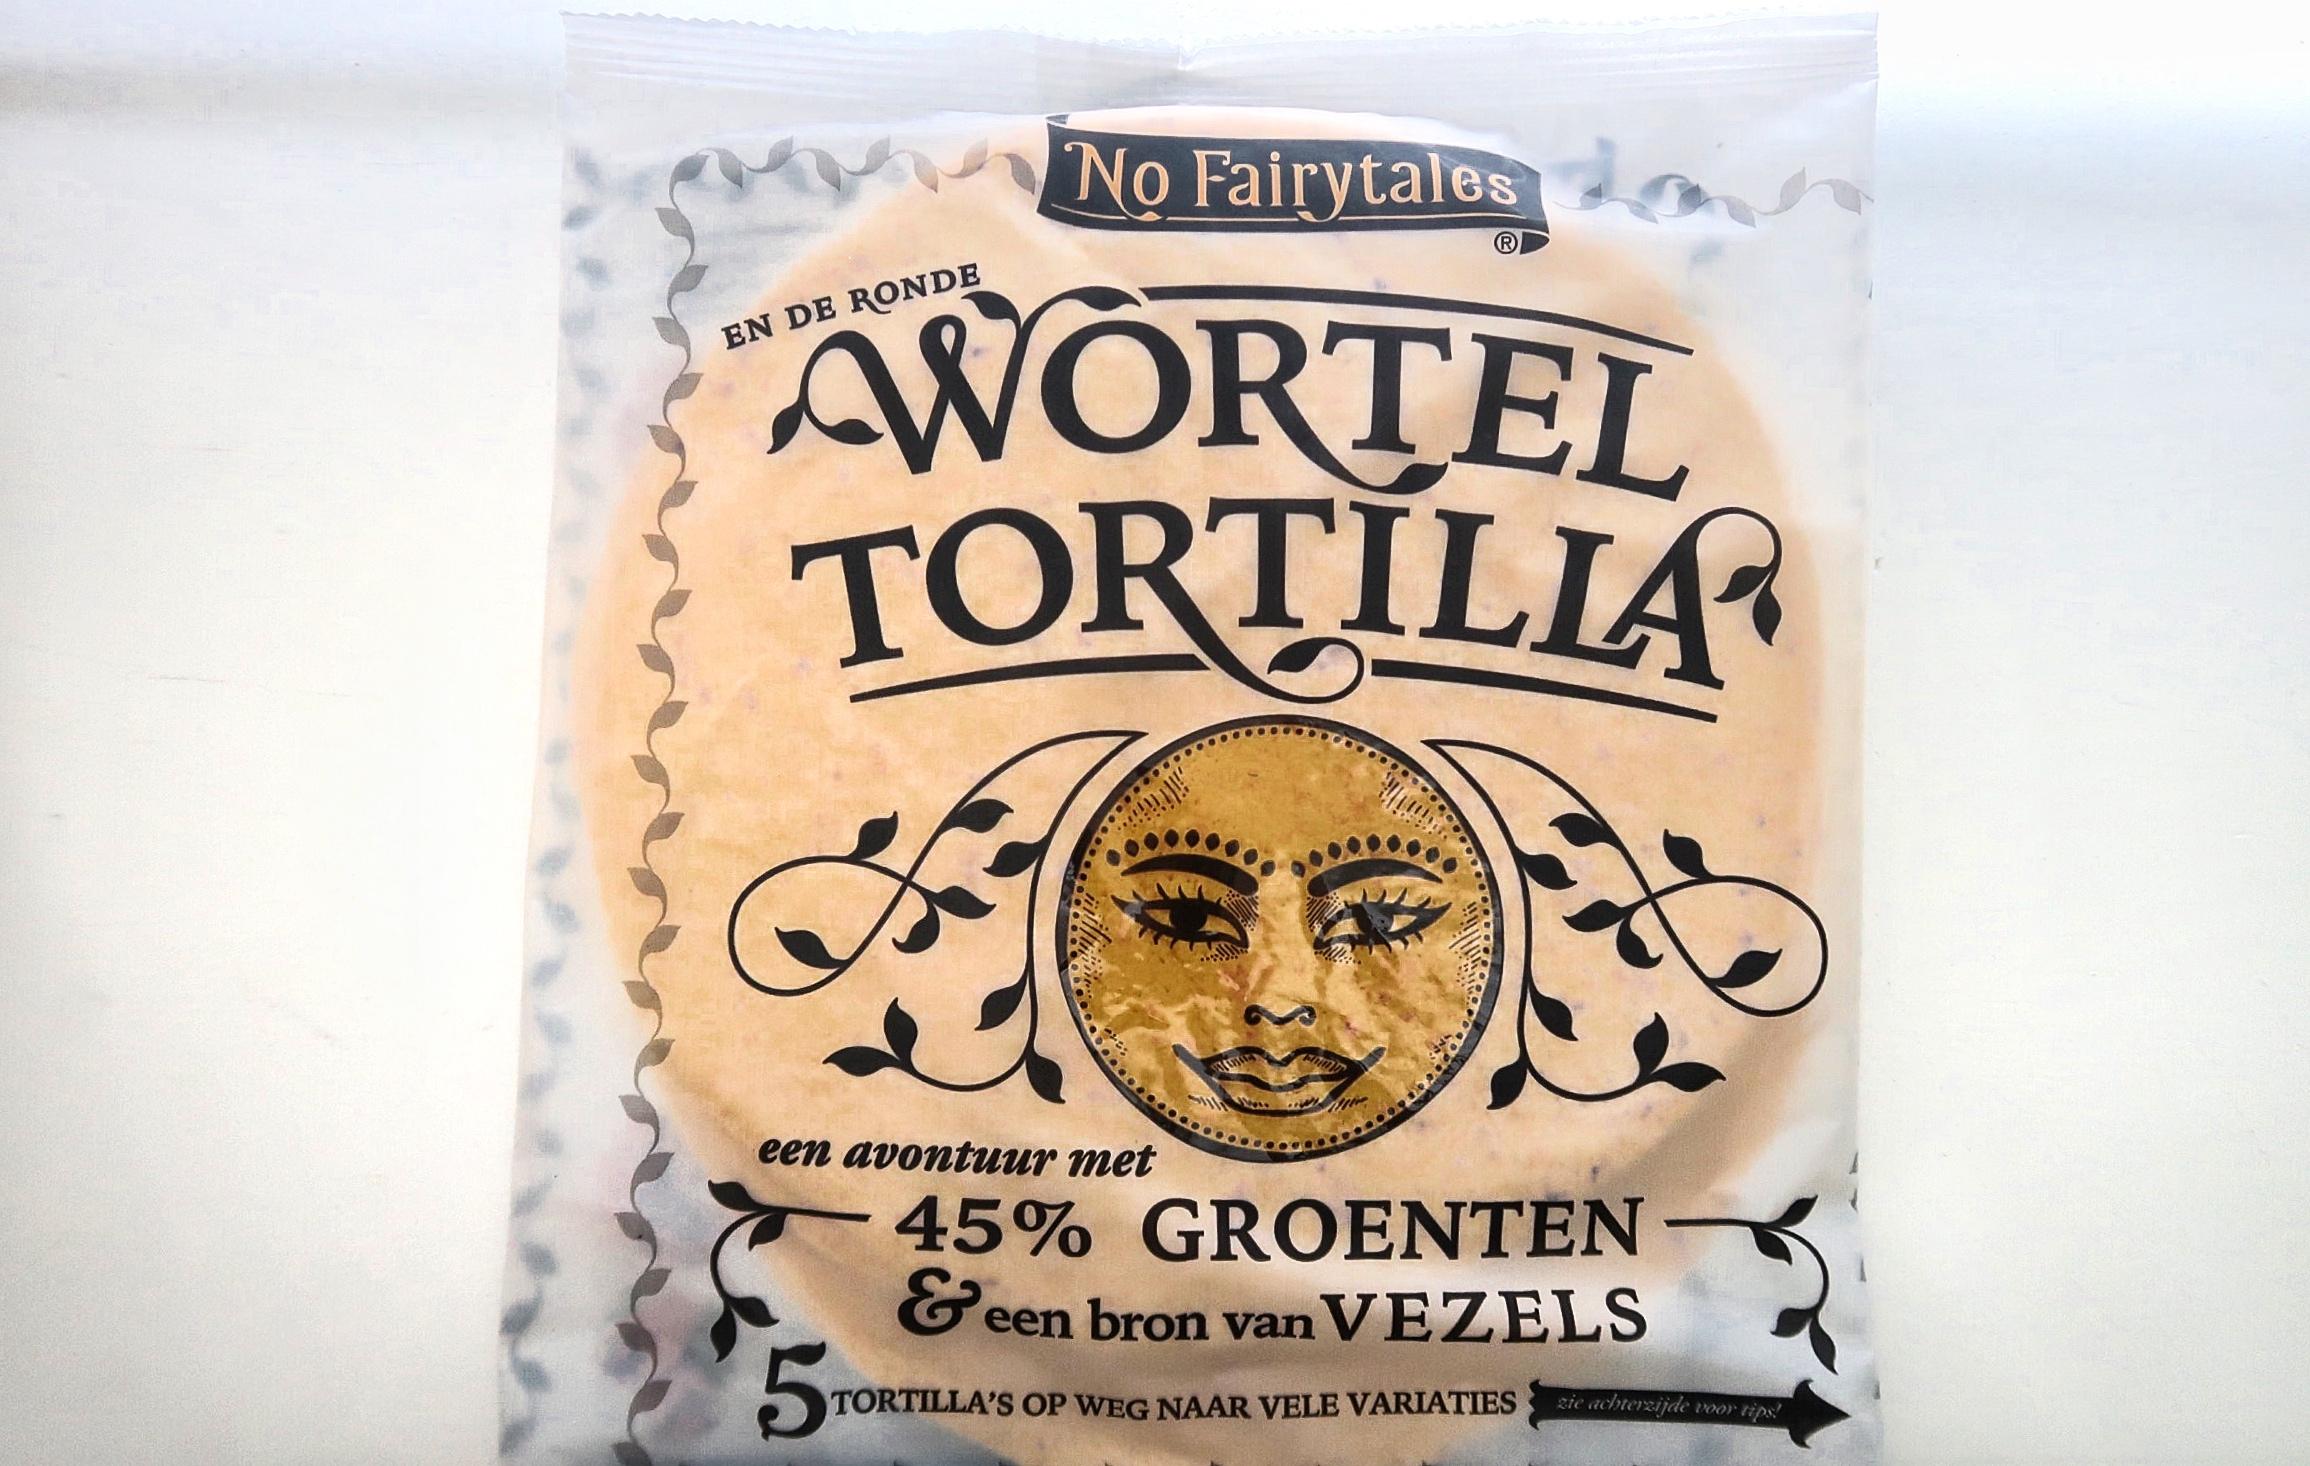 tortilla, no fairtytales, wortel tortilla